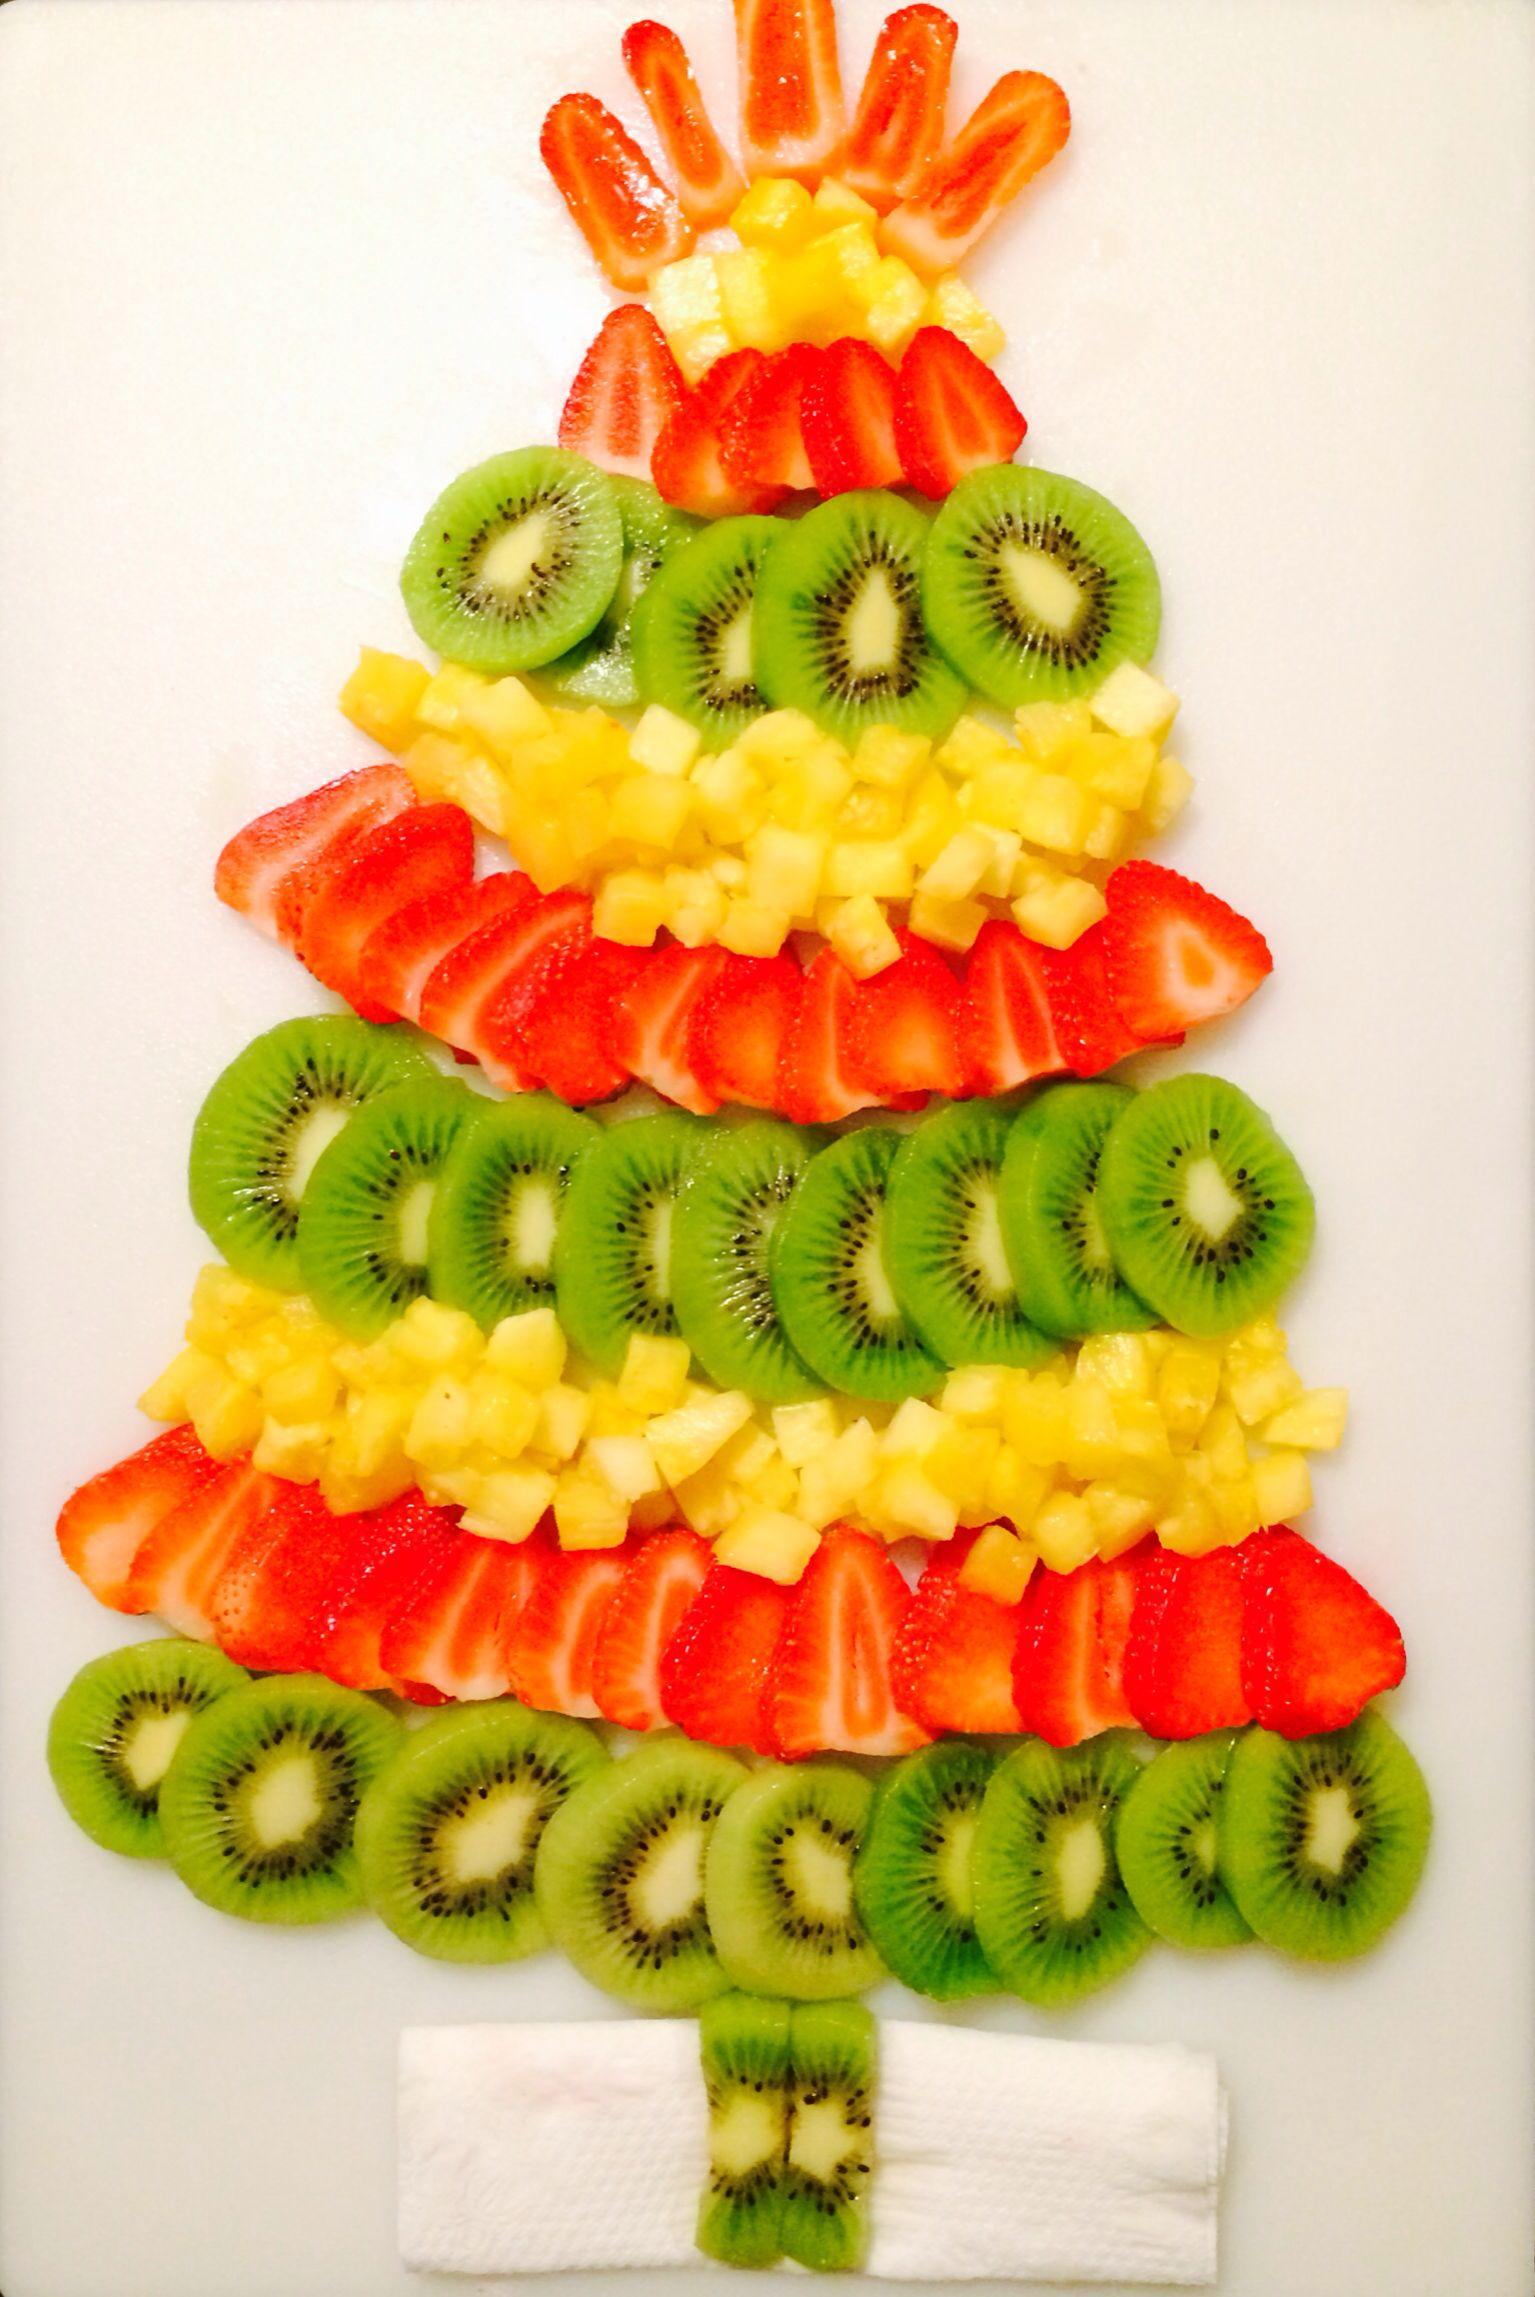 Christmas Tree Fruit Platter.Christmas Tree Fruit Tray Christmas Christmas Breakfast